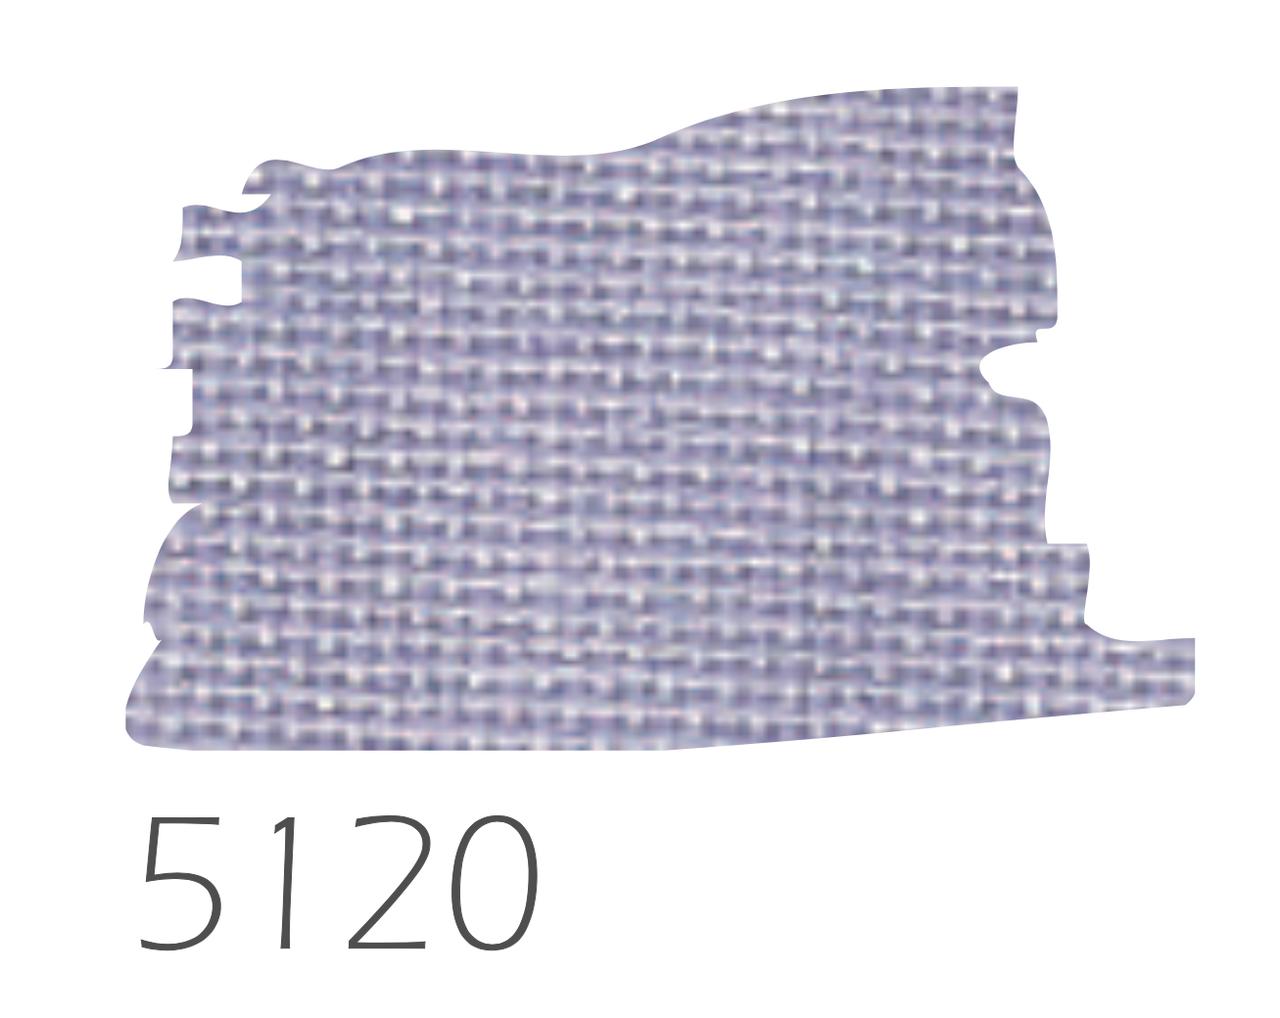 Тканина Zweigart (Murano Lugana) Мурано Лугана 32 ct - світло-фіолетовий